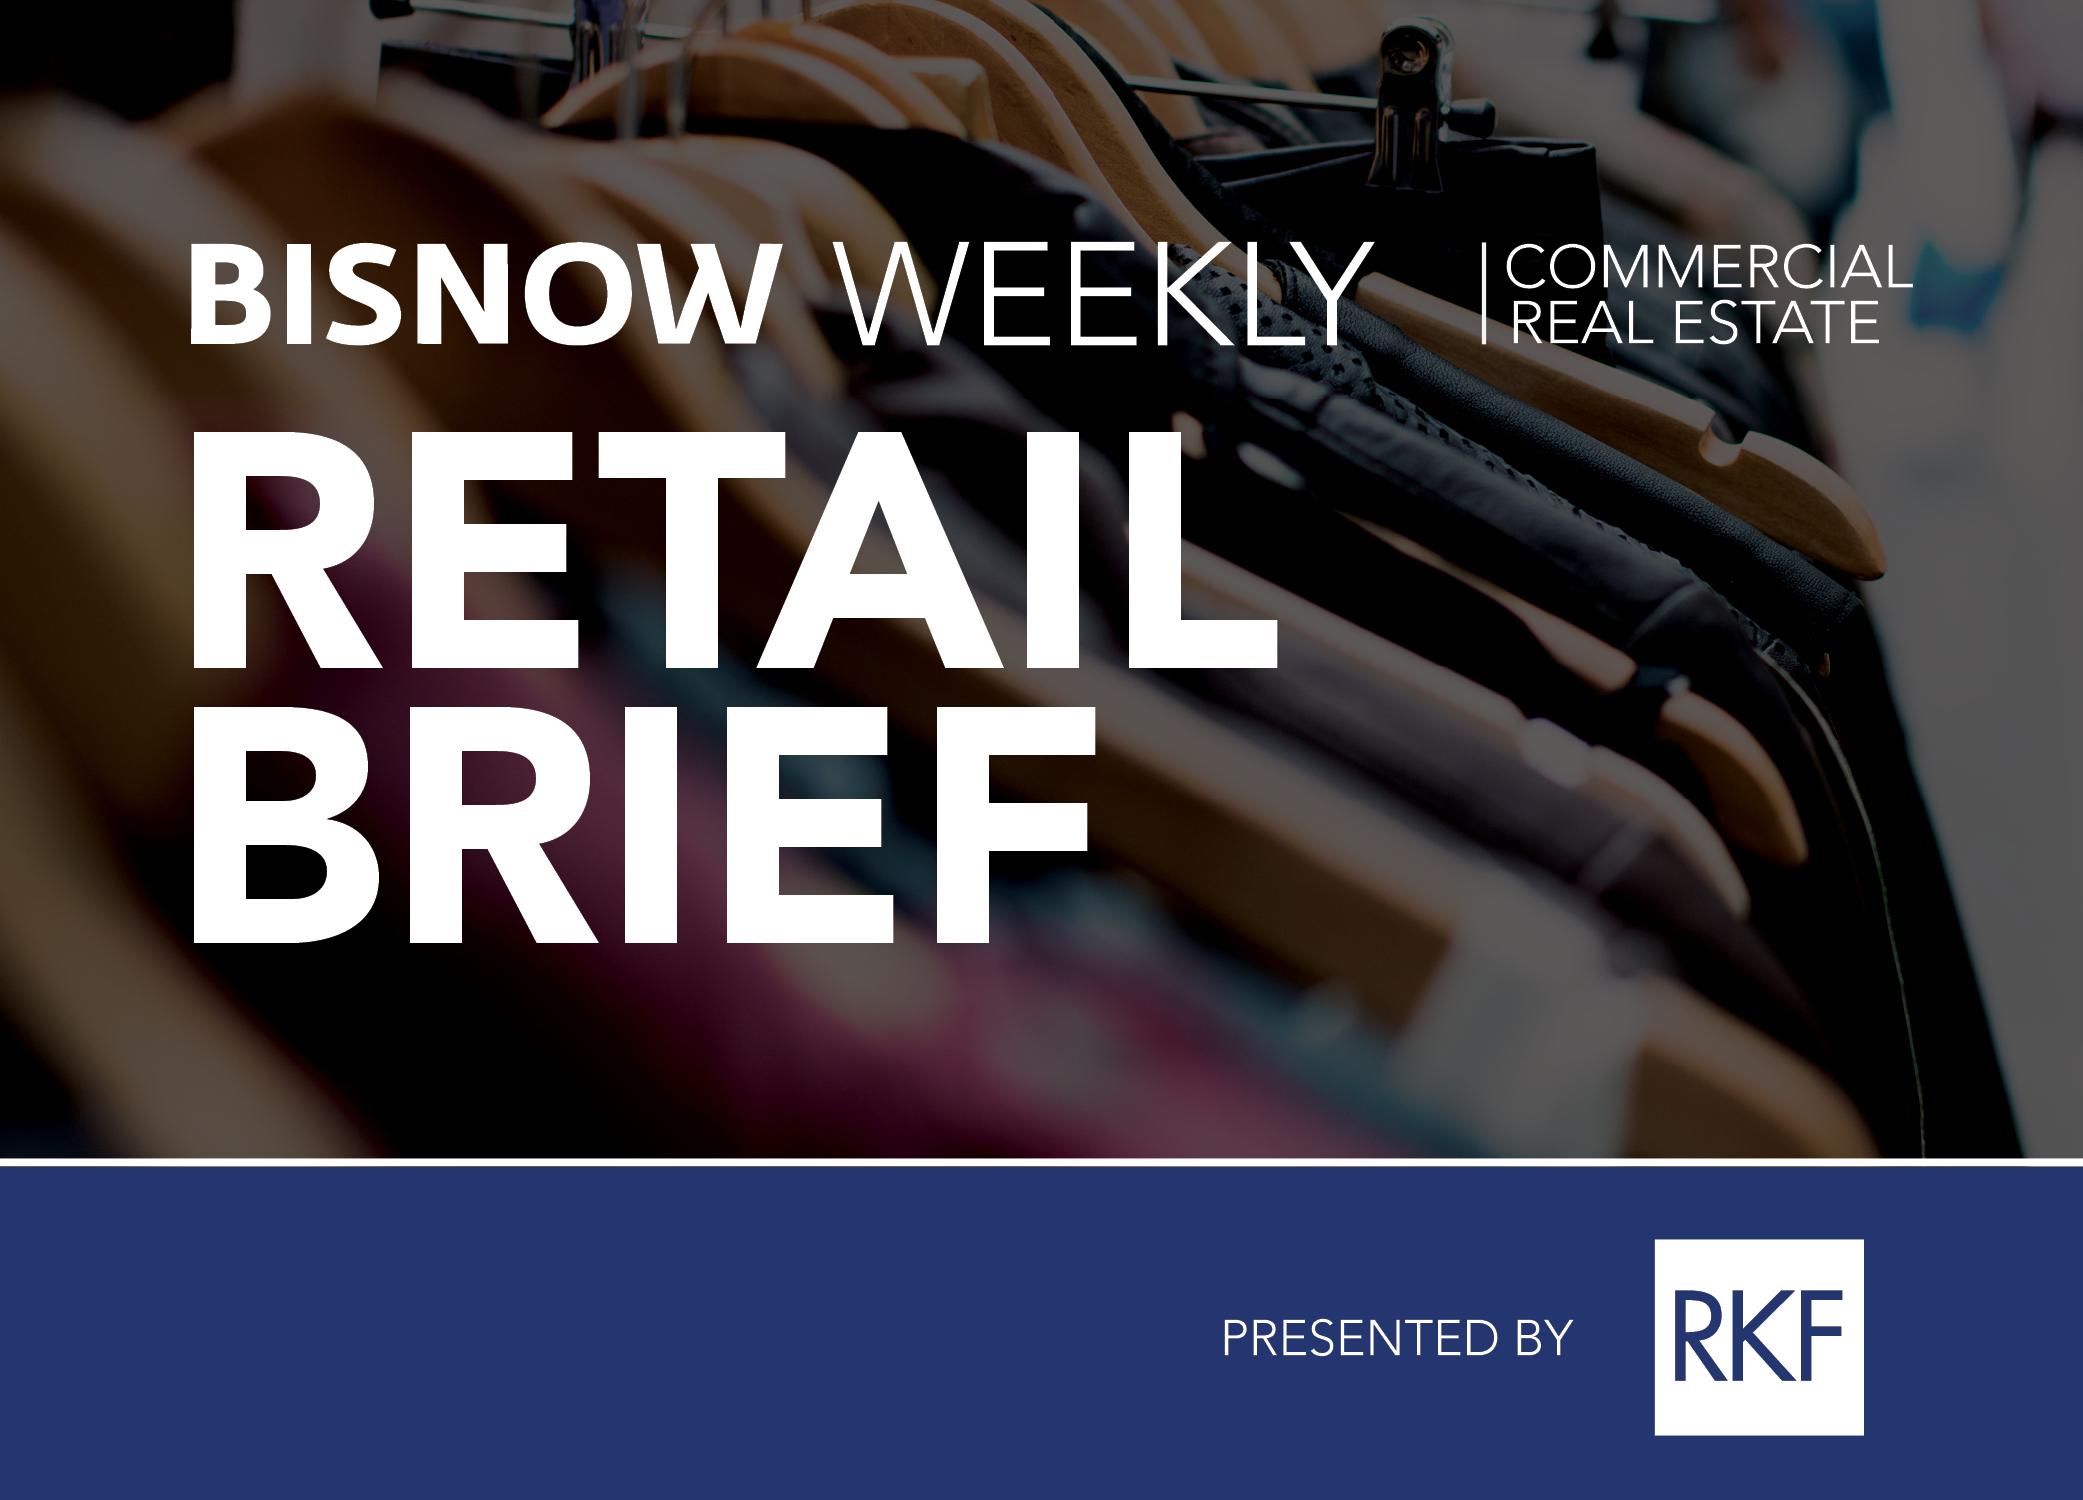 Bisnow Morning Brief Retail Weekly Brief [national]